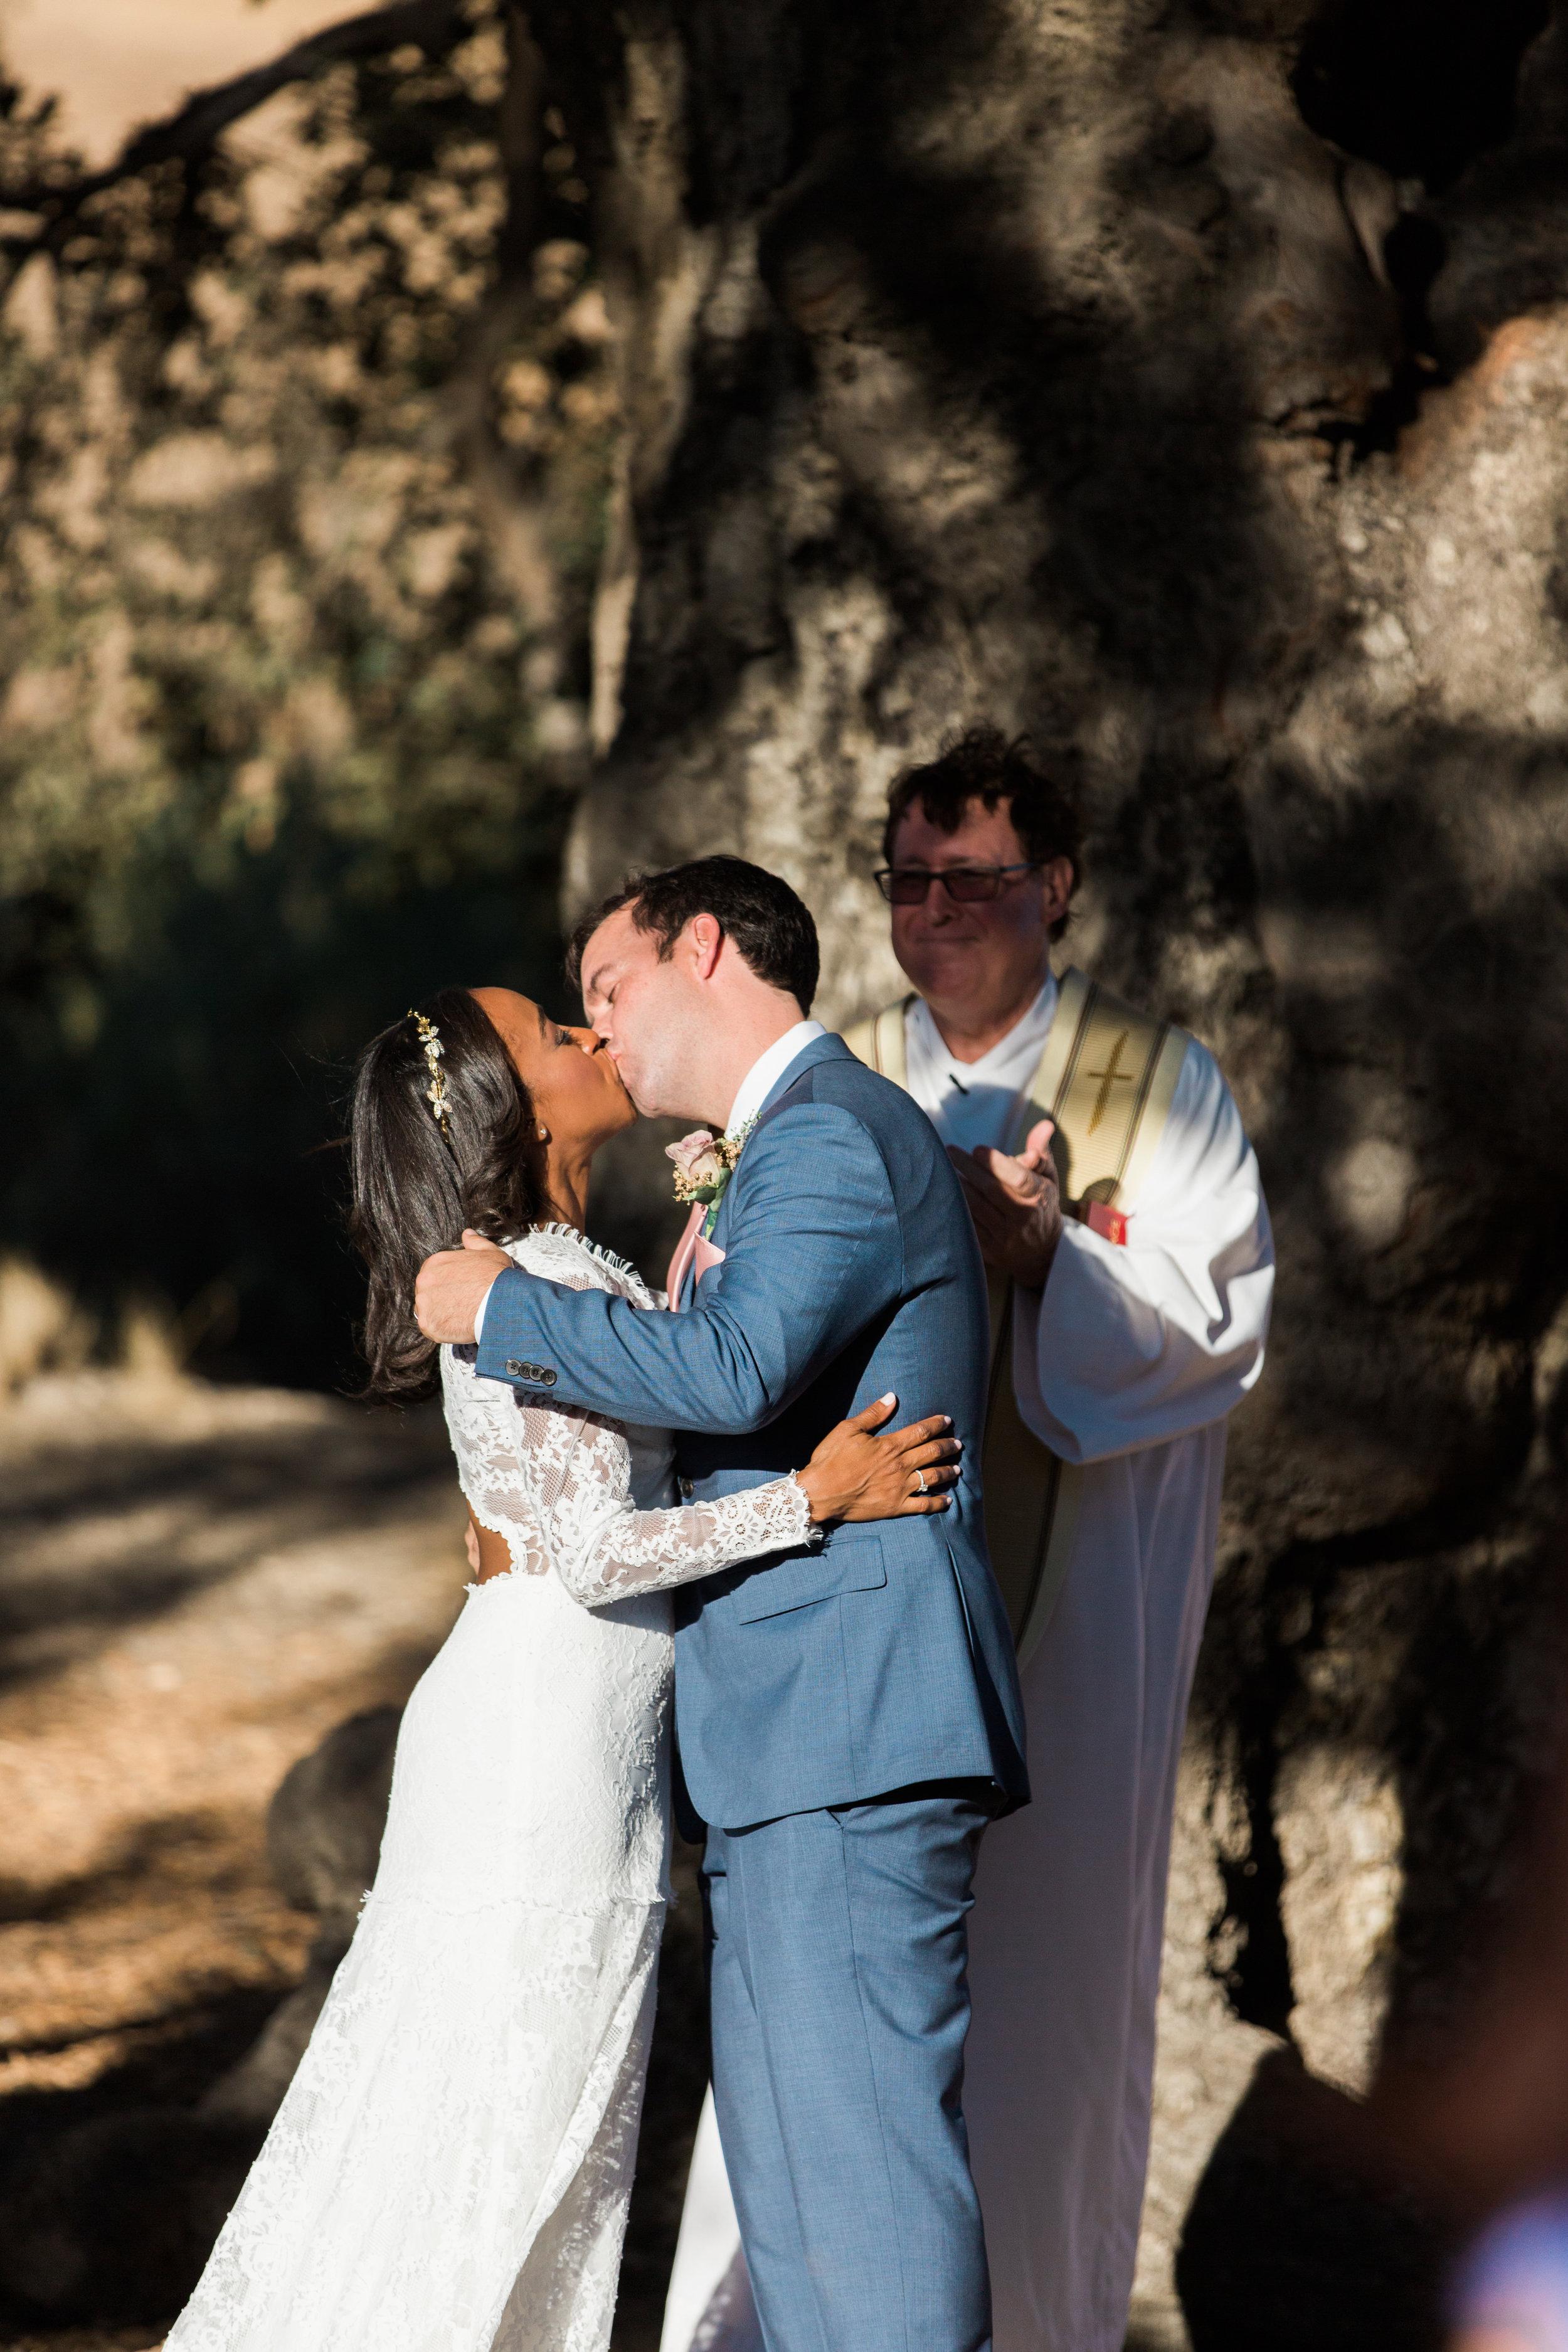 Jenny Quicksall Photography_www.jennyquicksall.com_California Wedding Photographer_Highland Springs Ranch and Inn Resort_Cherry Valley California (47).JPG